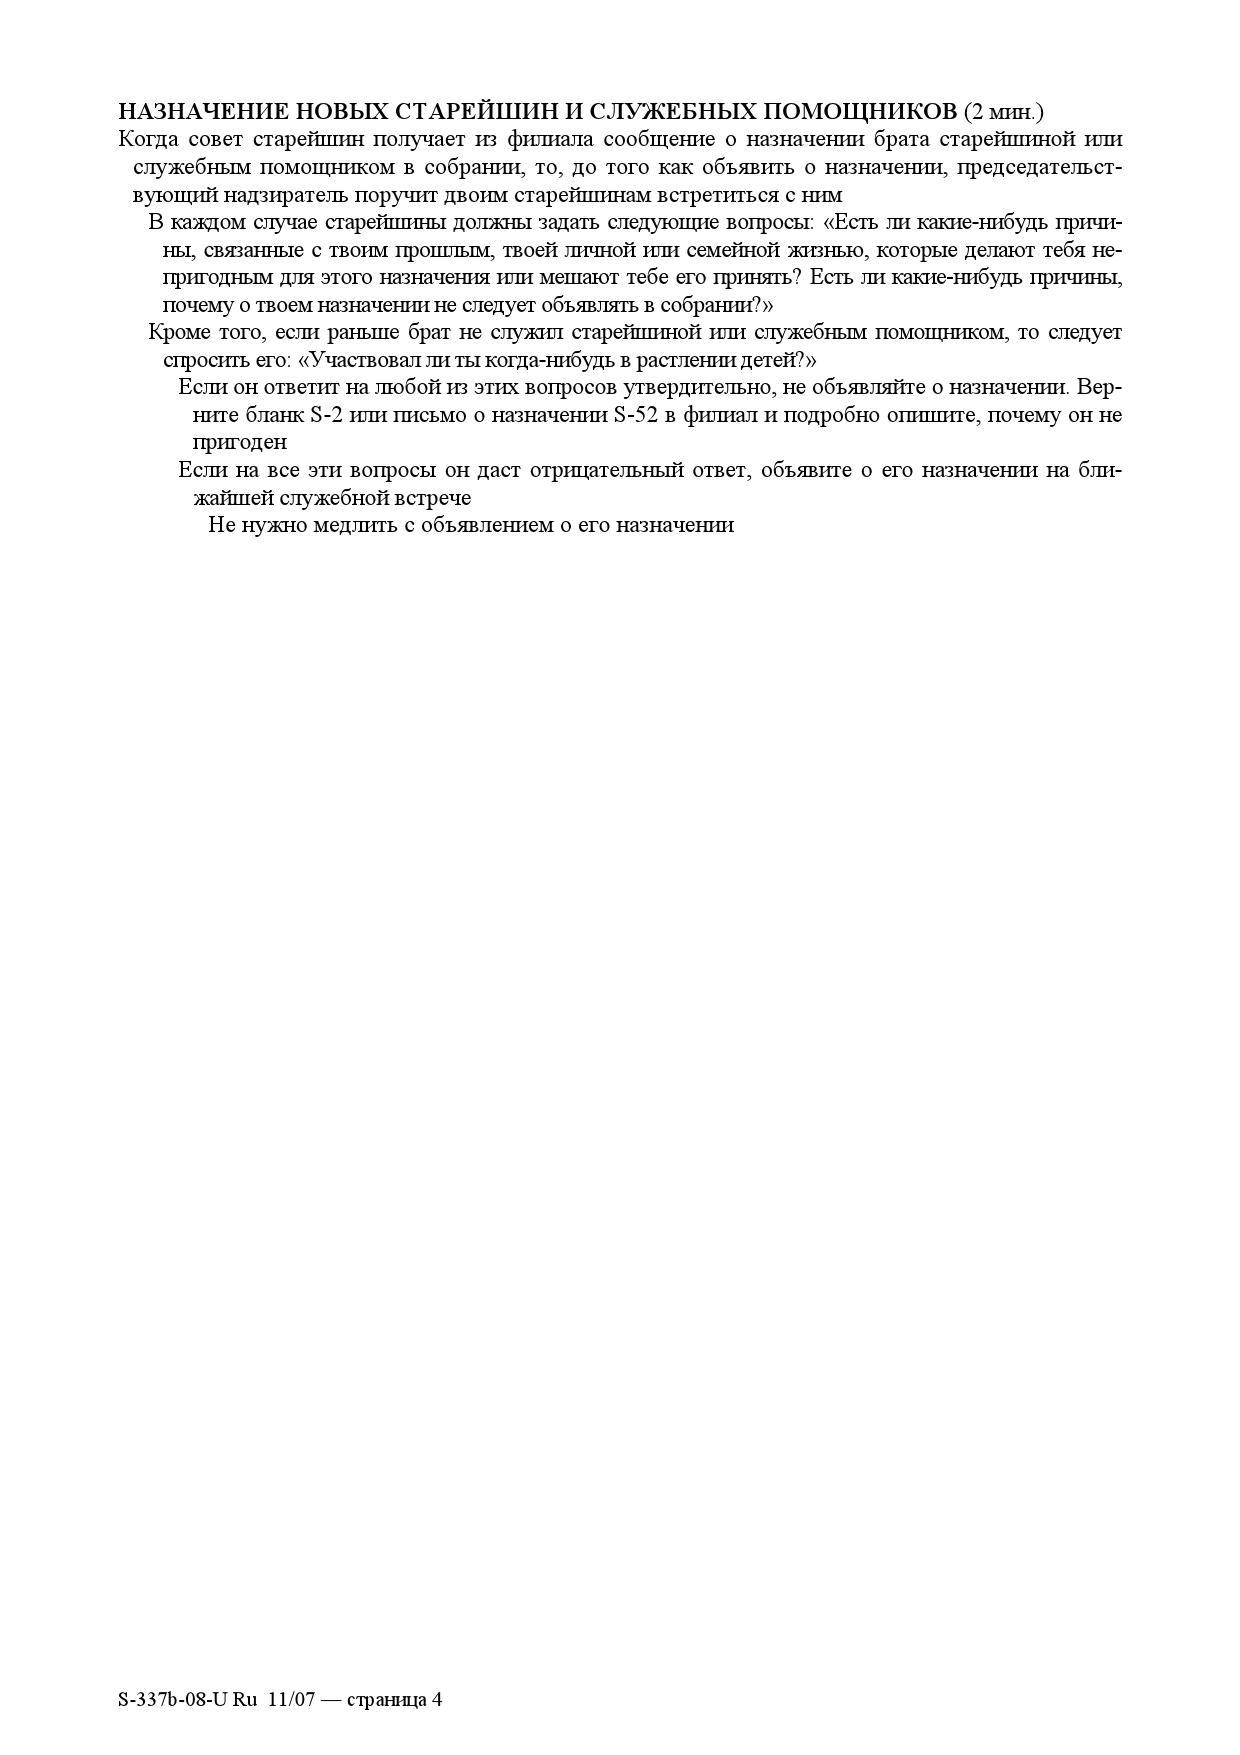 S-337-U-11-07 (ВО, брак СИ, растление-назначение)_000004